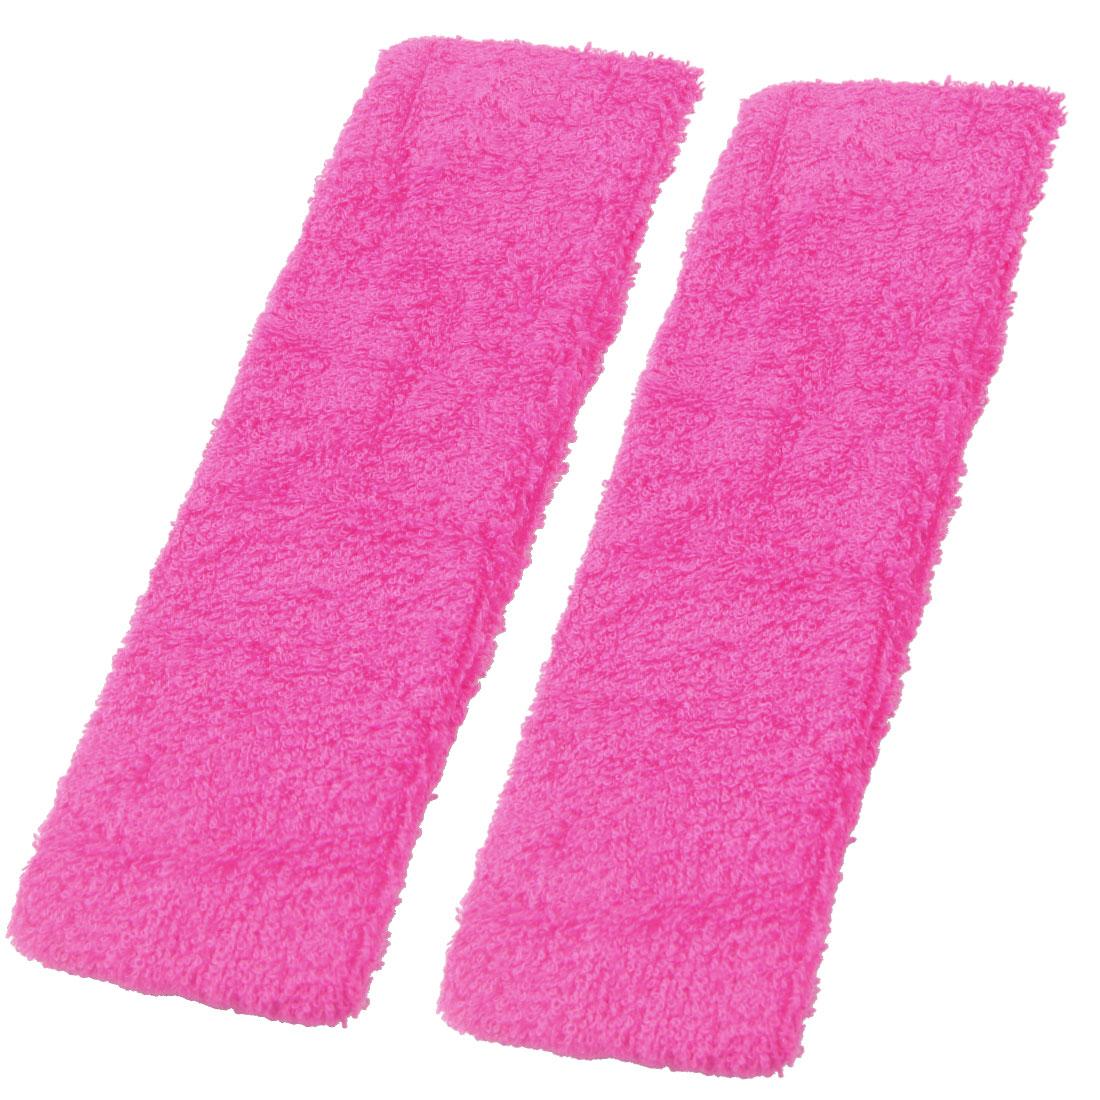 2 Pcs Fuchsia Spa Bathing Elastic Fabric Headband for Women